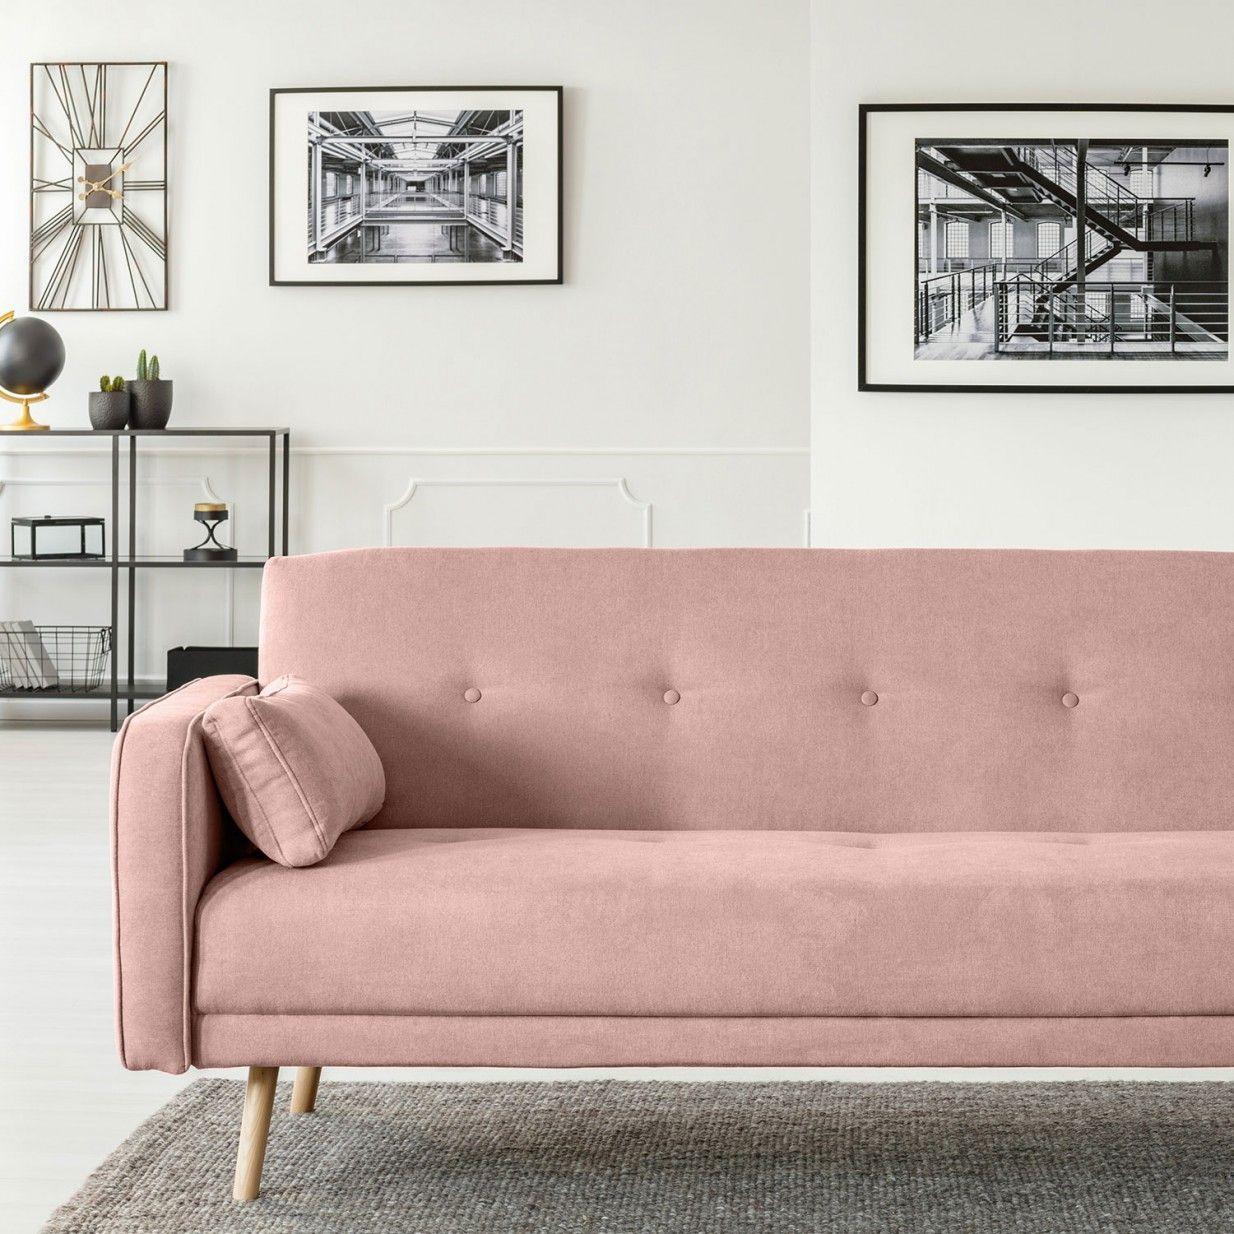 Sofa Stuttgart stuttgart sofa bed pink cosmopolitan design monoqi